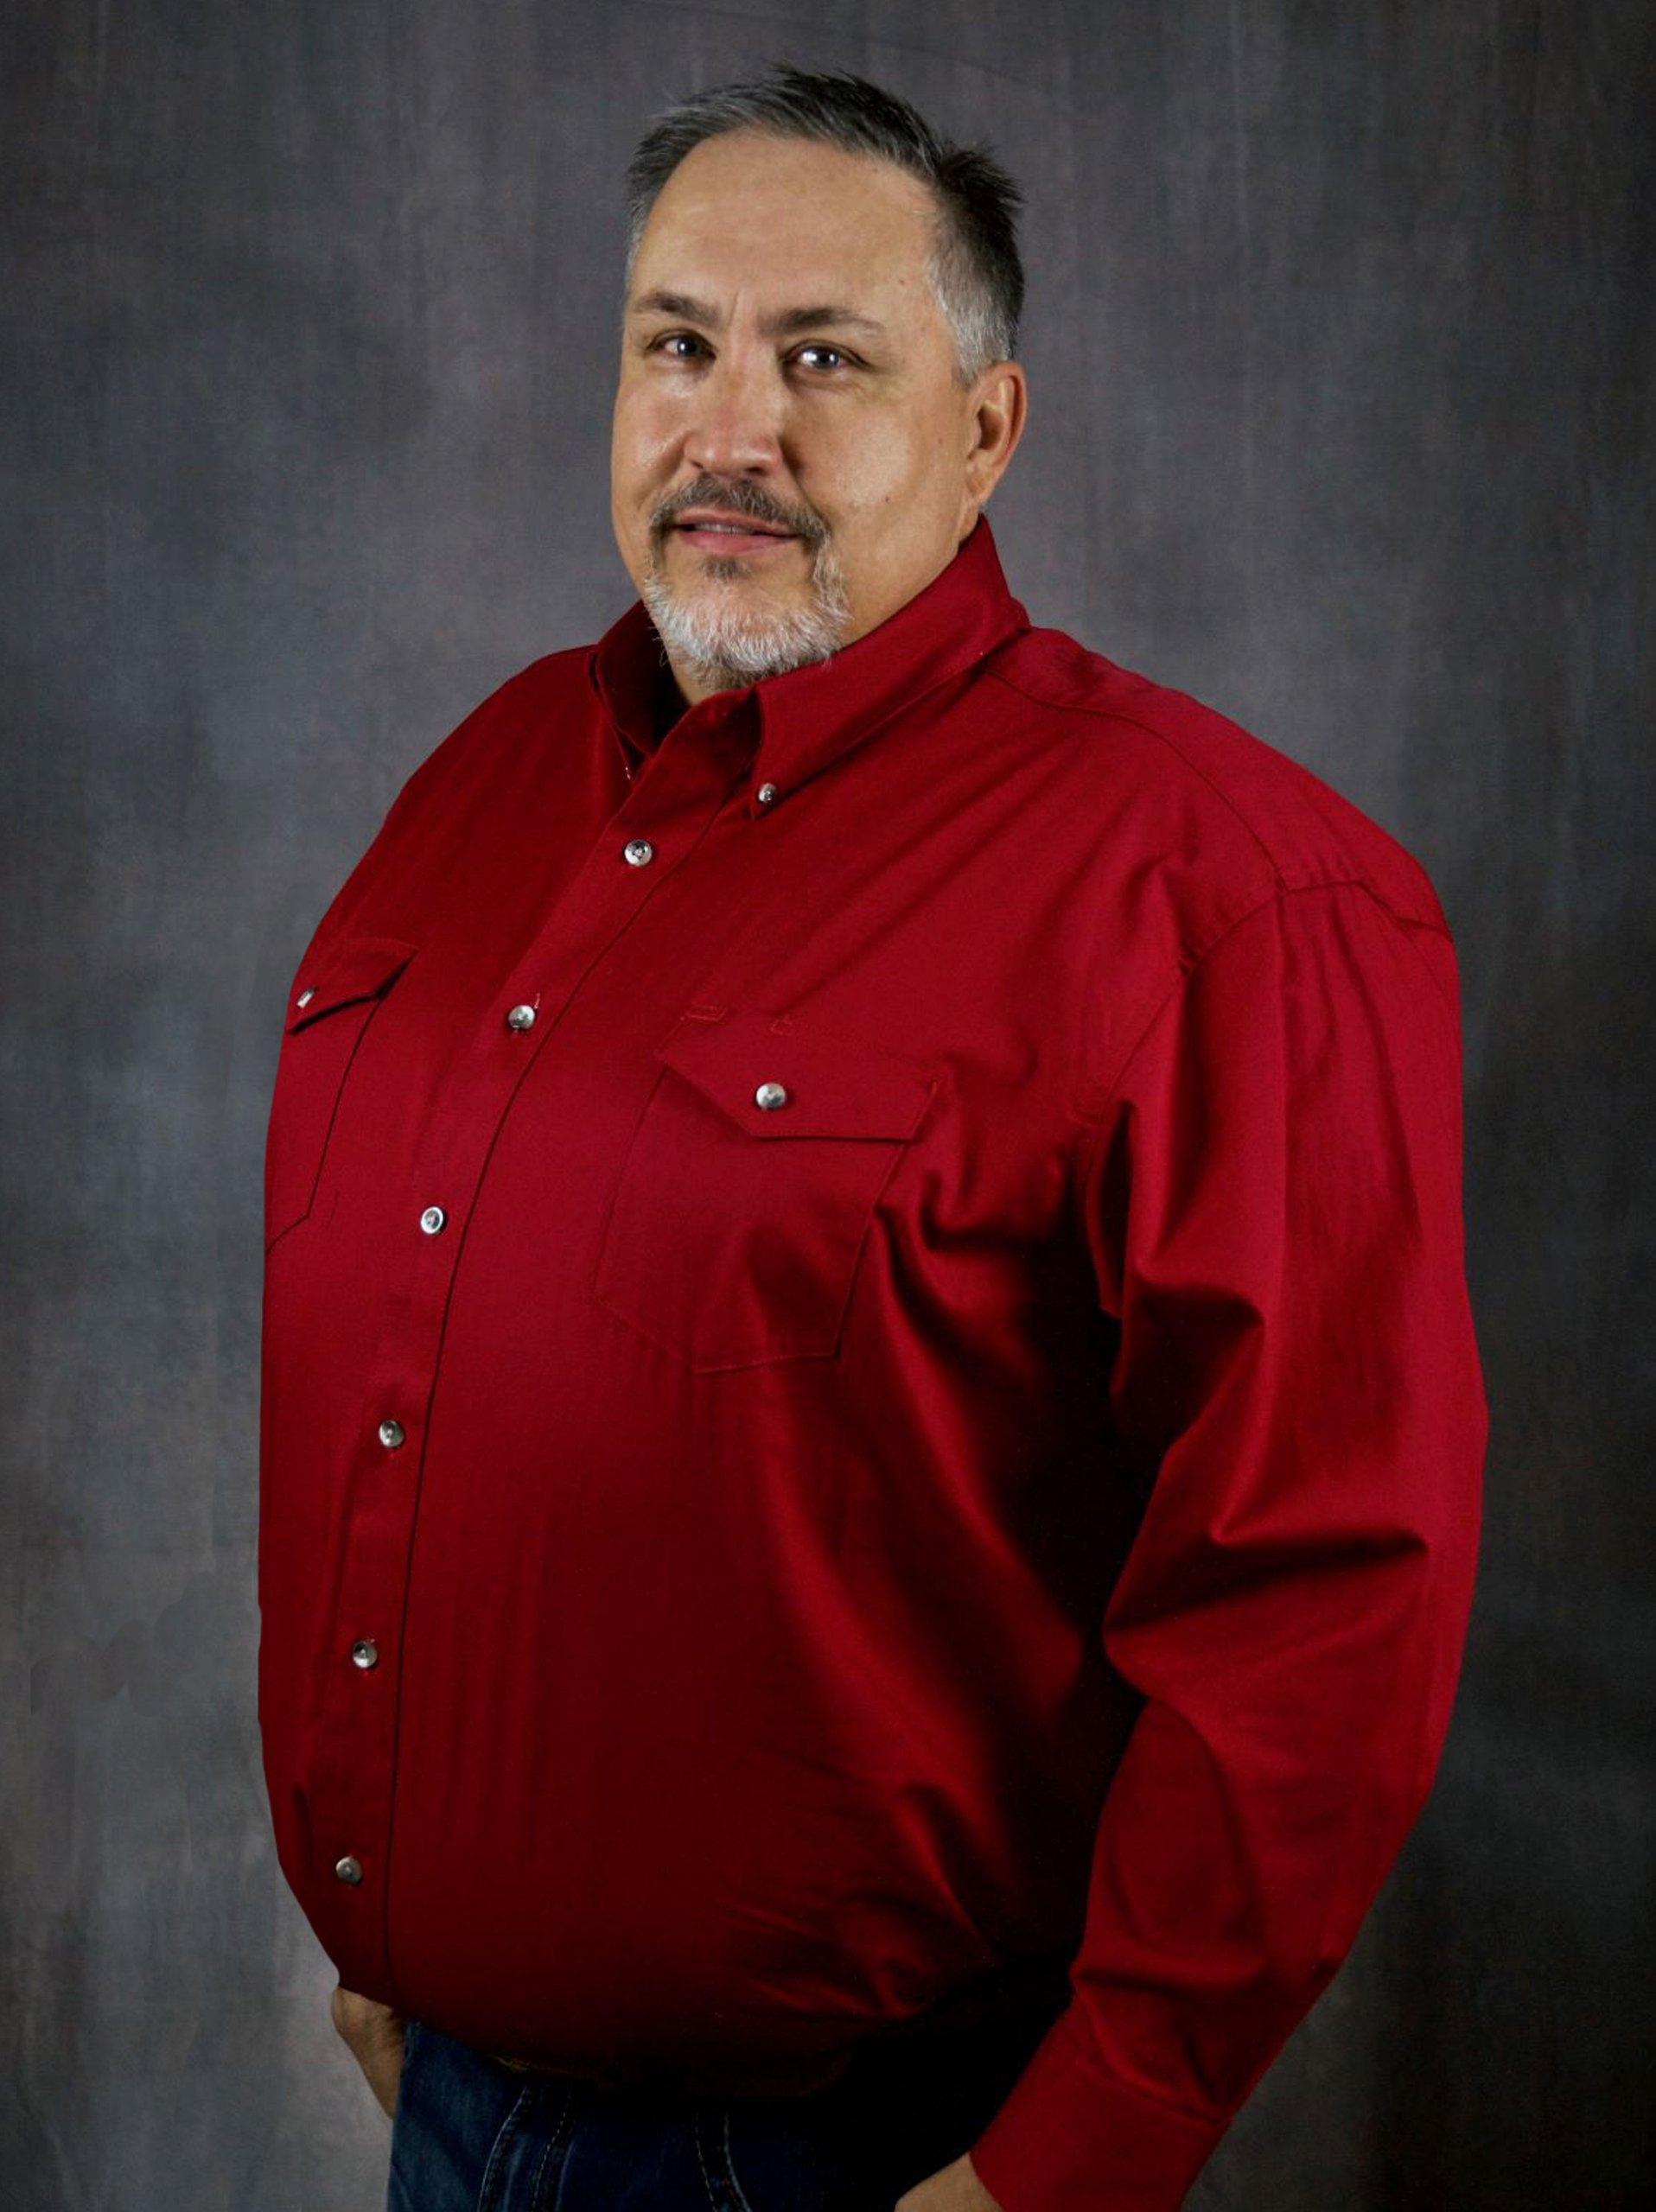 Jim Schlosser